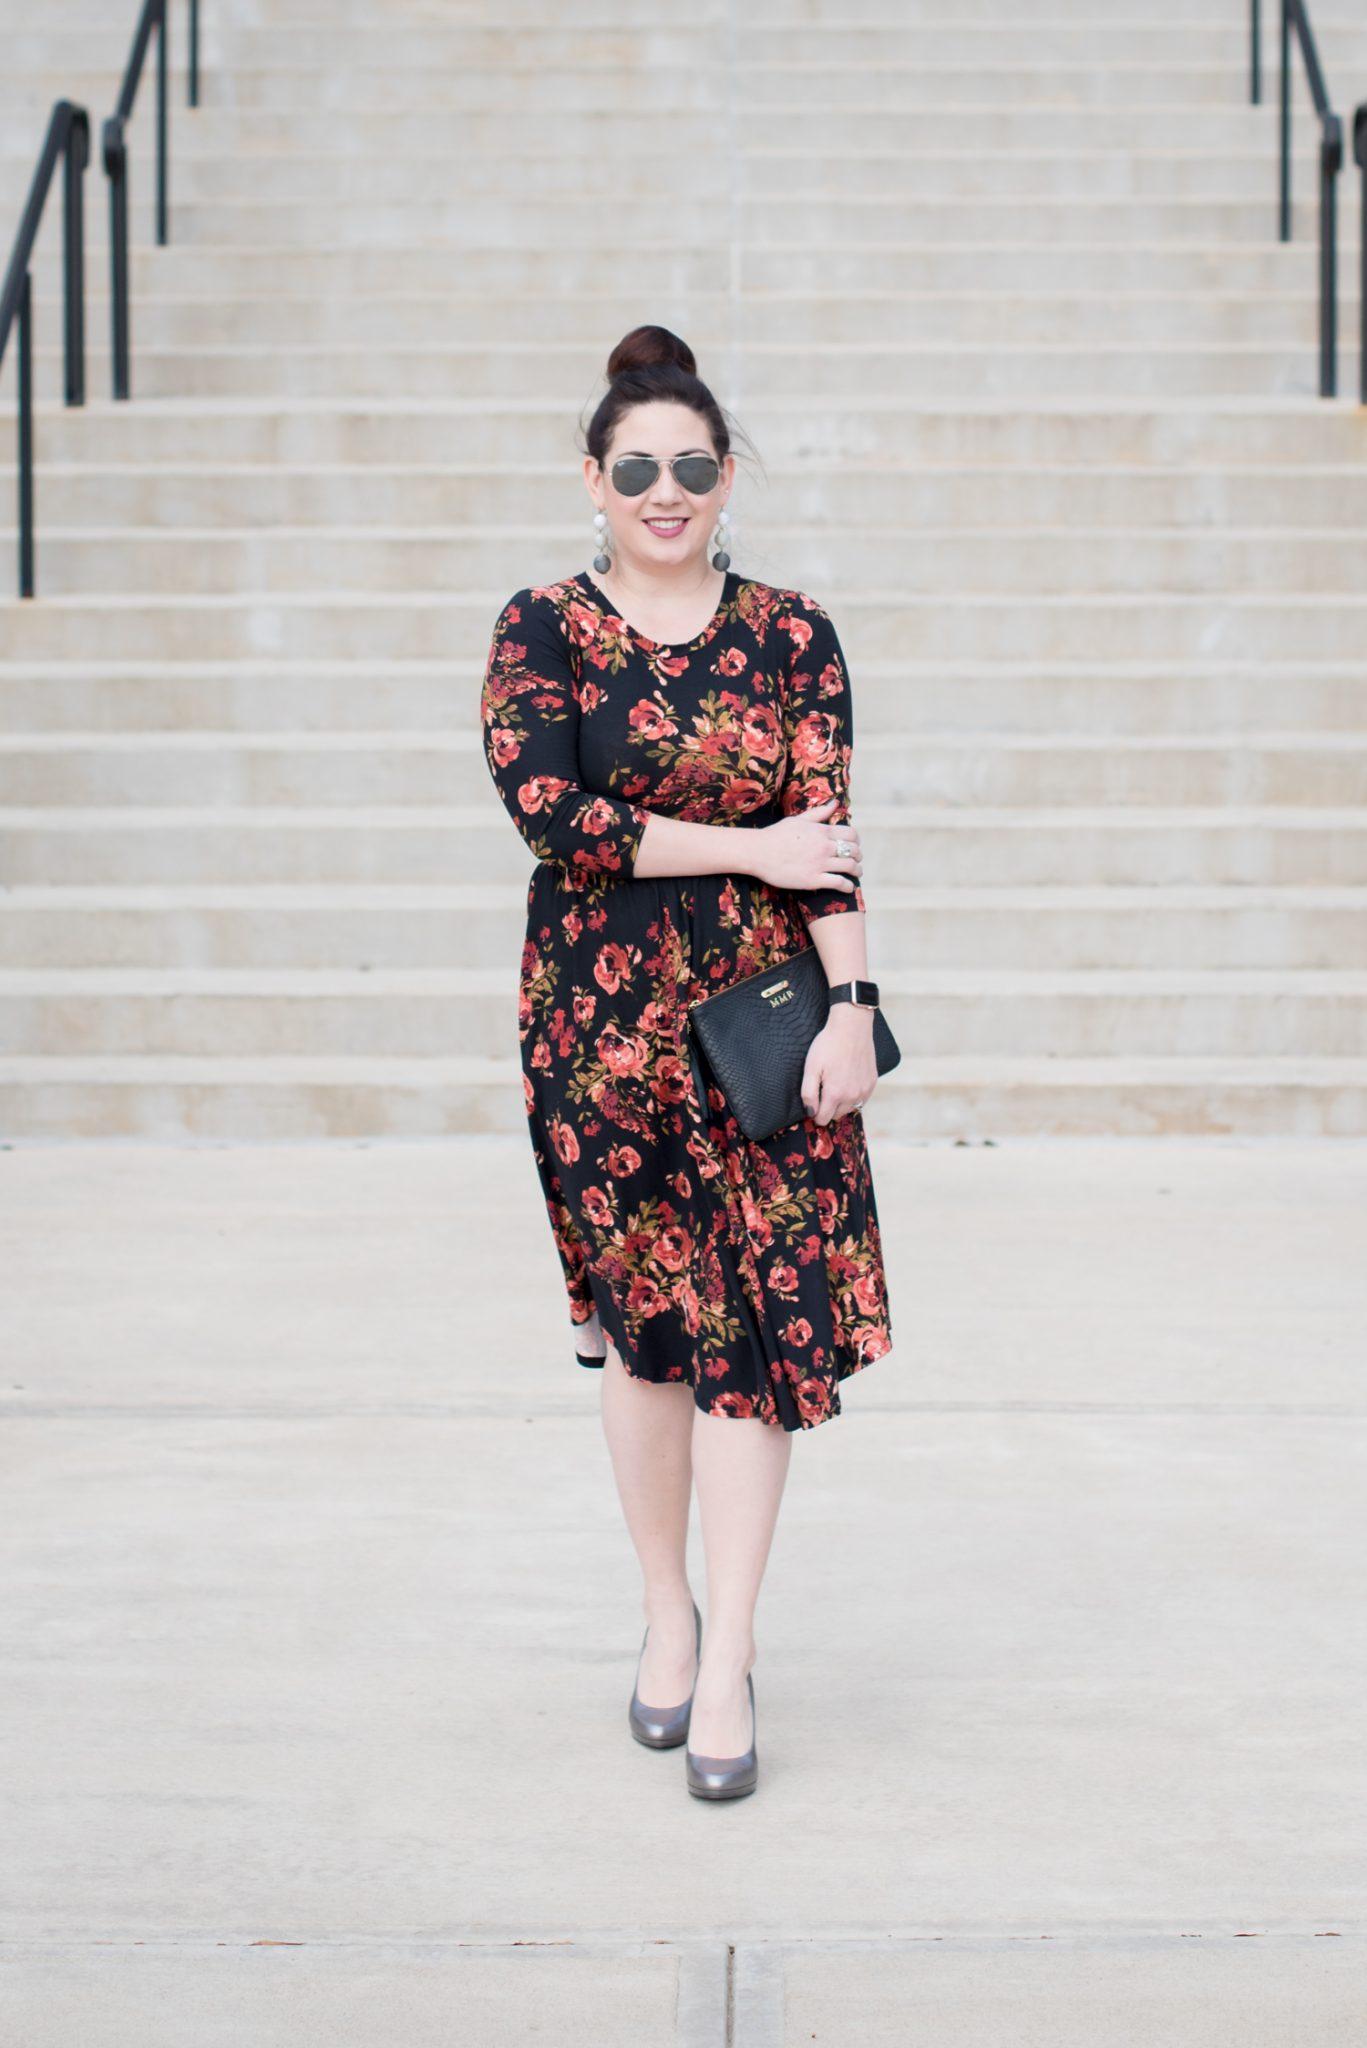 Winter Floral Midi Dress for Galentine's Day via @missmollymoon